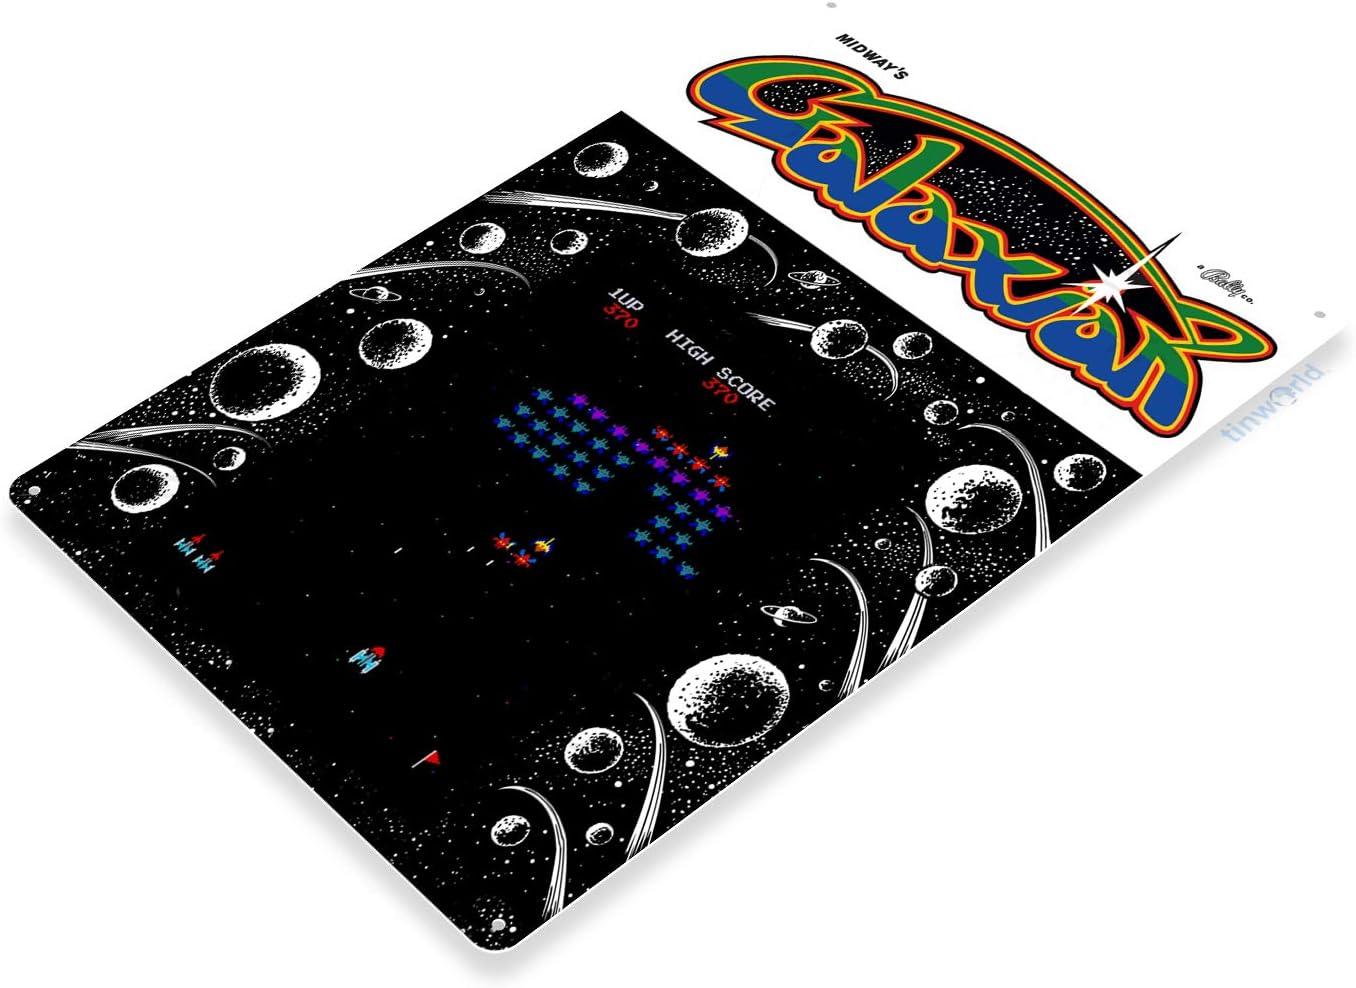 TIN SIGN Galaxian Arcade Shop Game Room Art Marquee Console Metal Décor A836